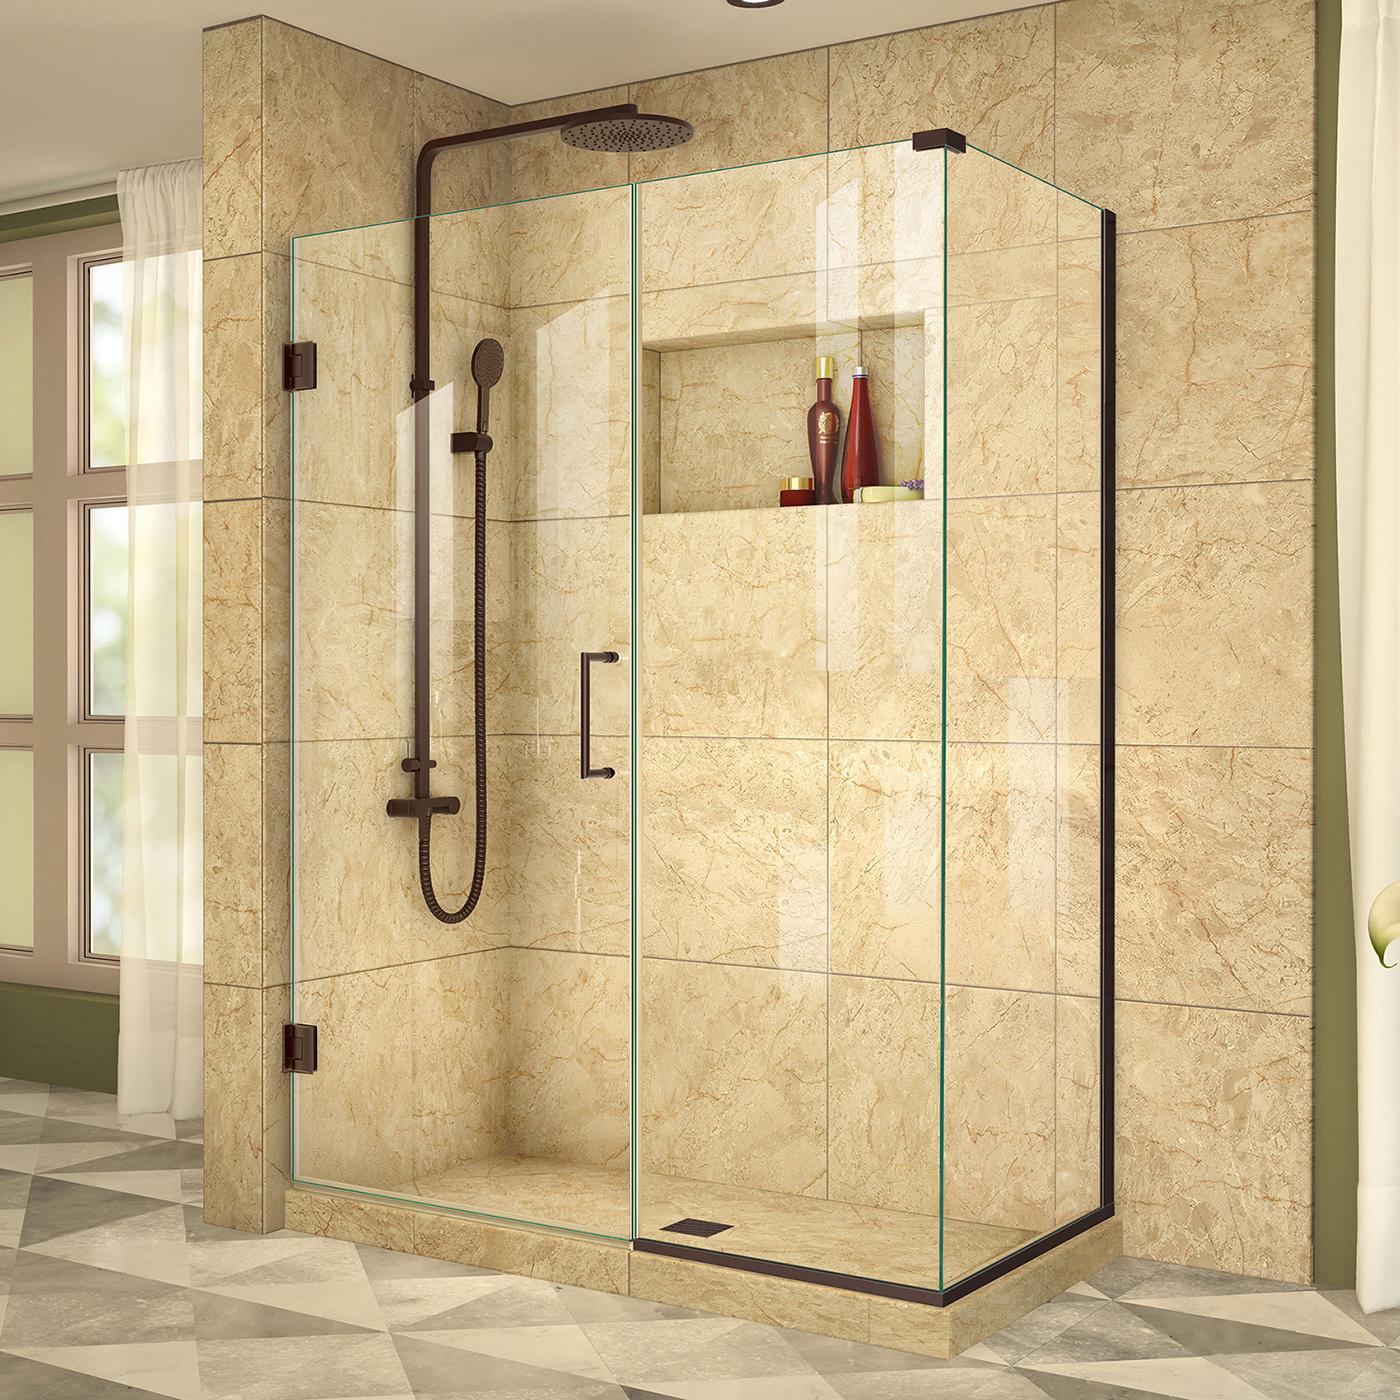 Dreamline Shen 24460340 06 Unidoor Plus 46 X 34 Shower Enclosure